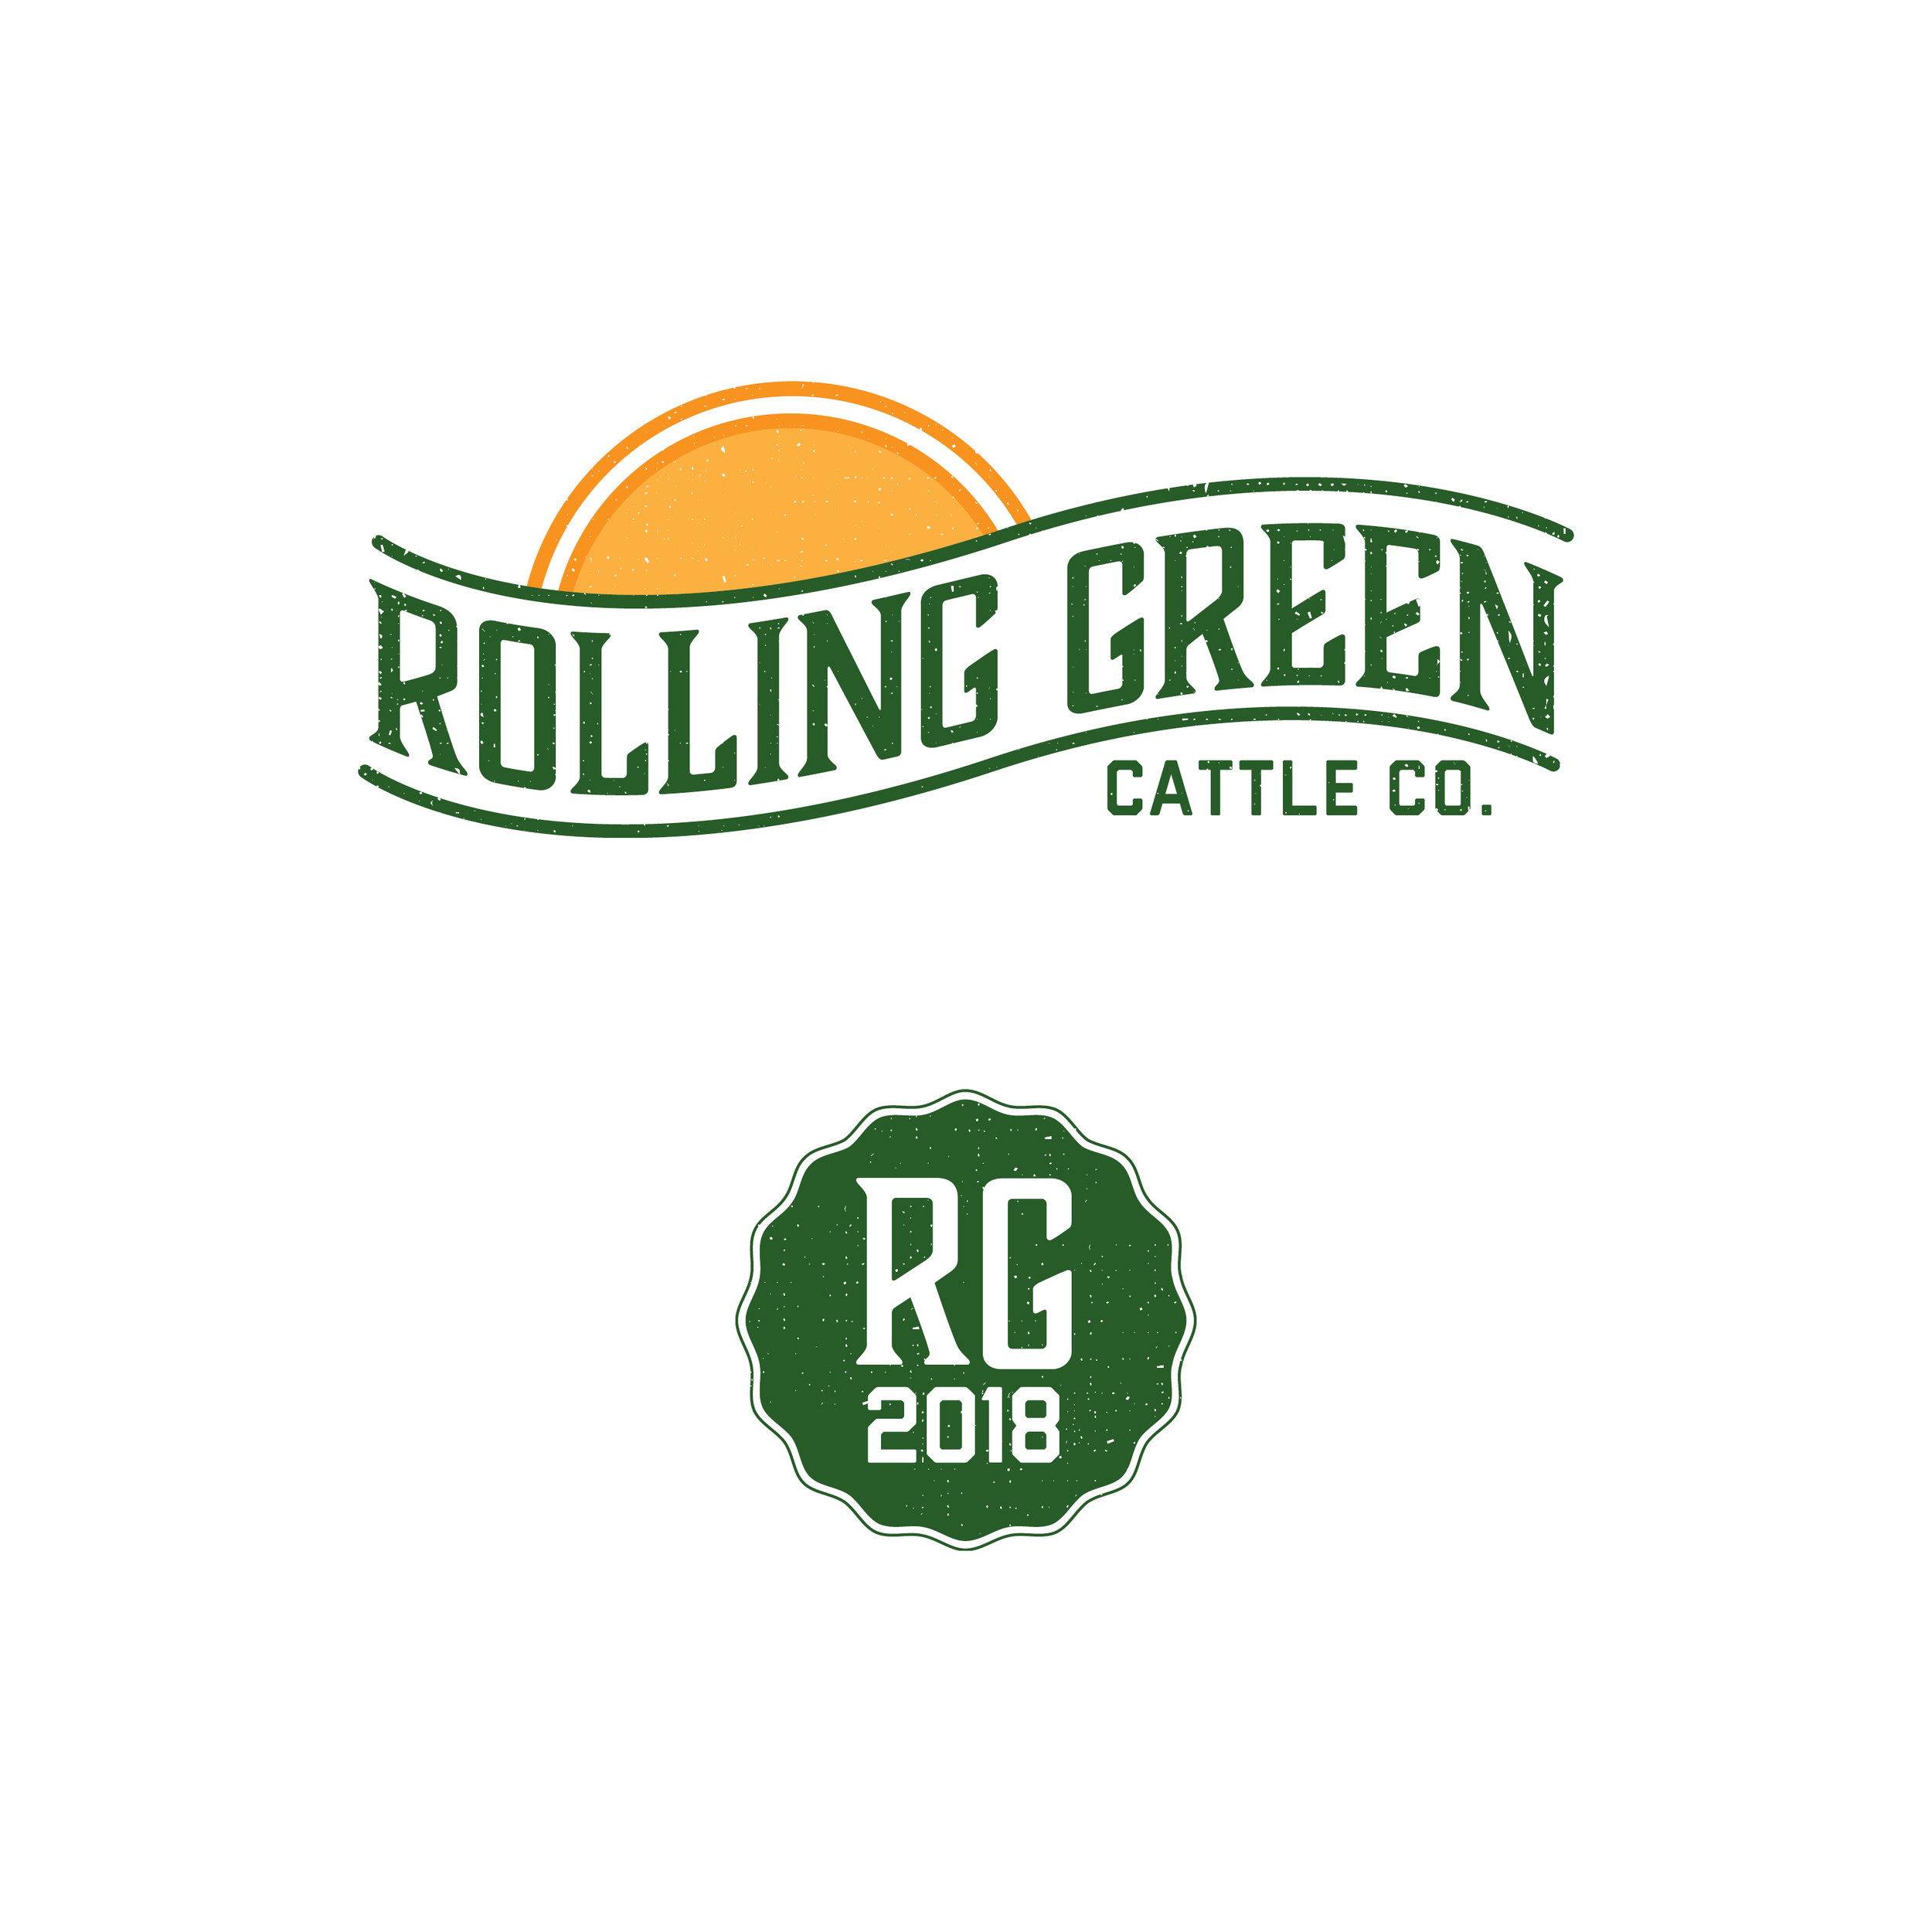 RollingGreen.jpg